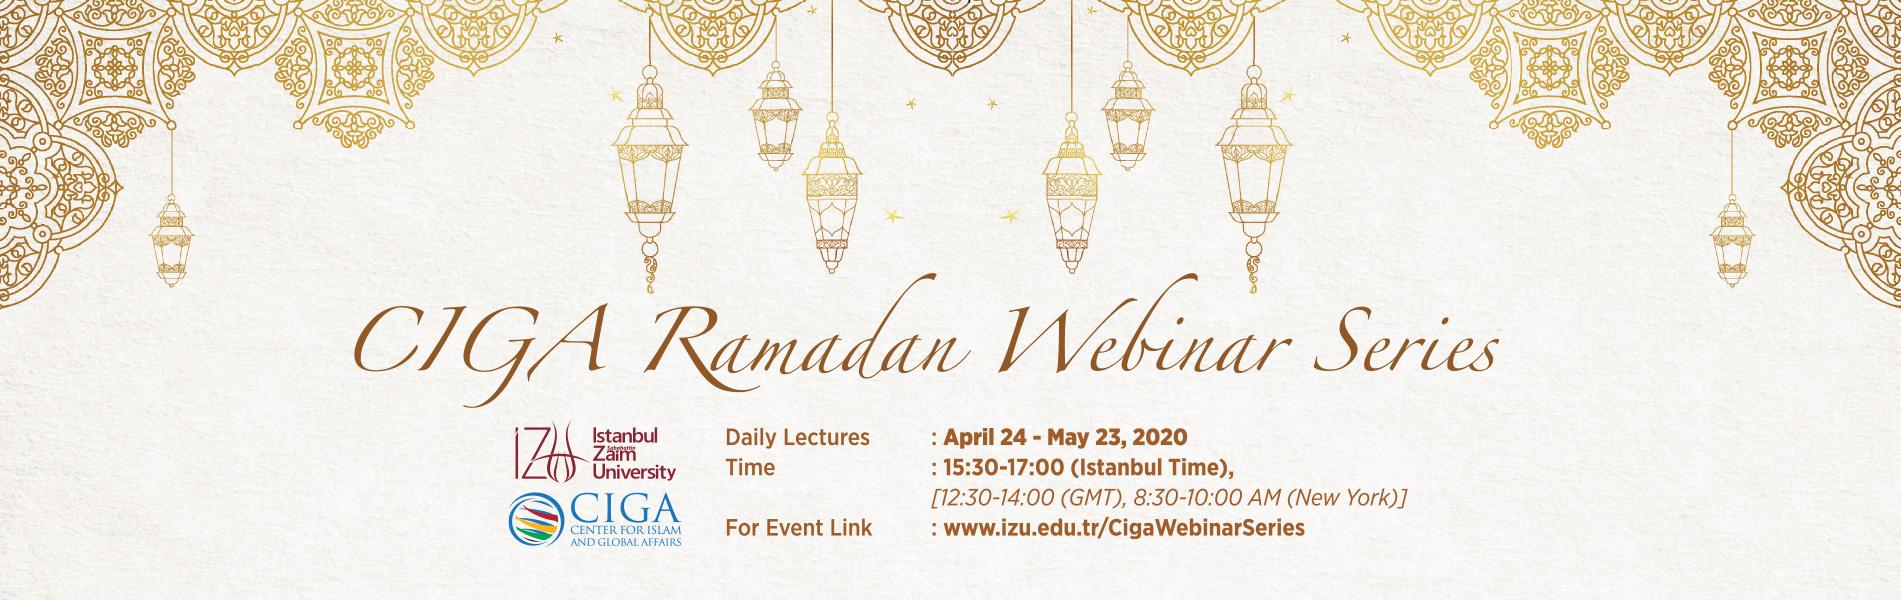 !!! CIGA Ramadan Webinar Series-Web Banner